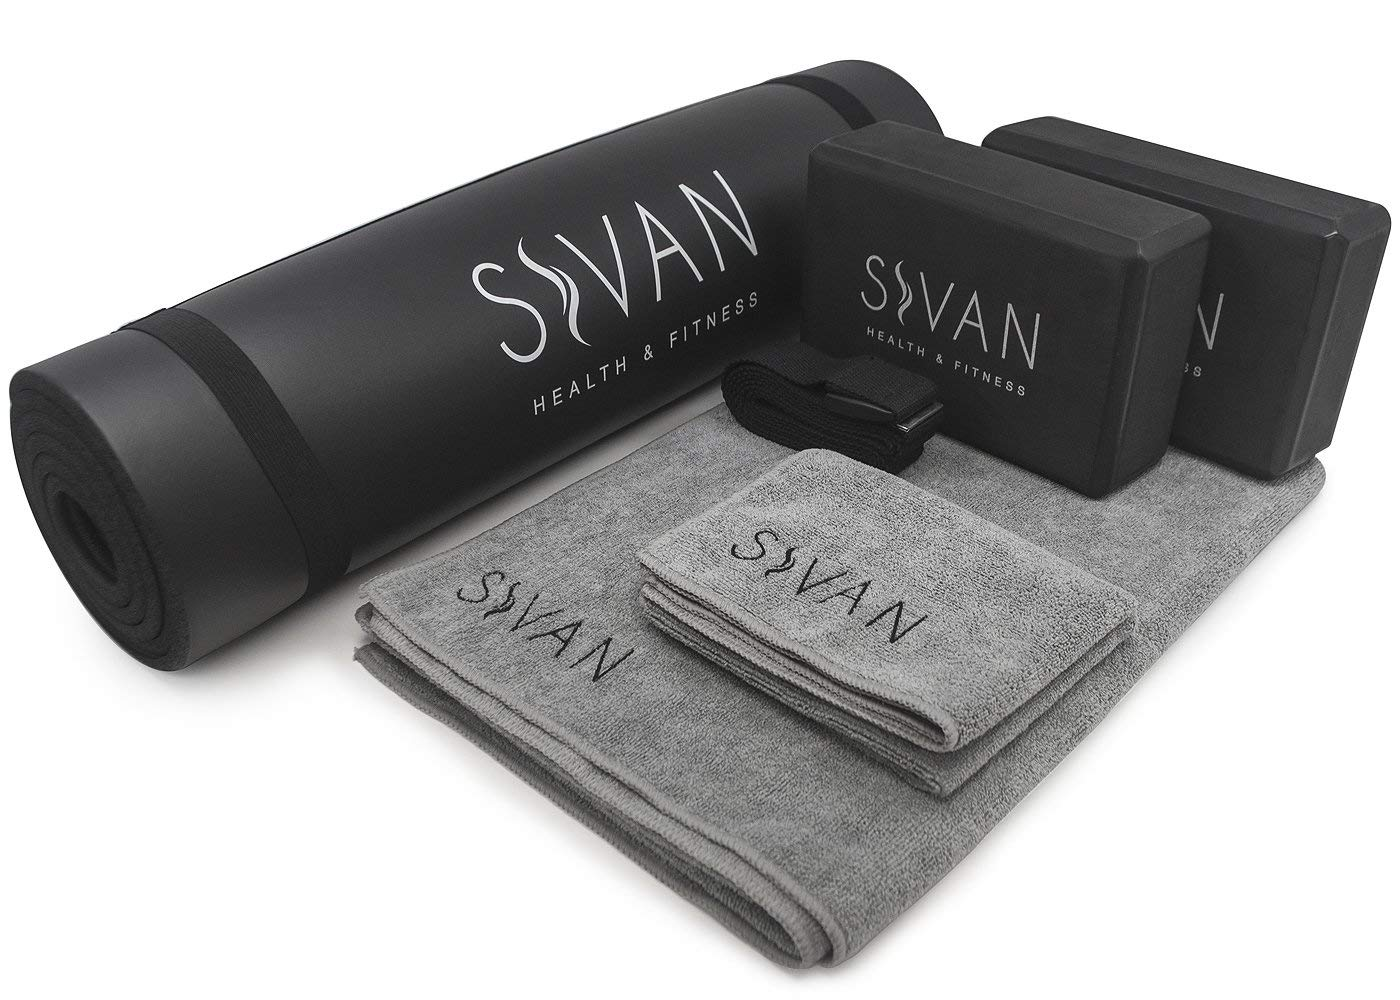 Sivan Salud y Fitness Yoga Set 6-Piece- Incluye 1/2